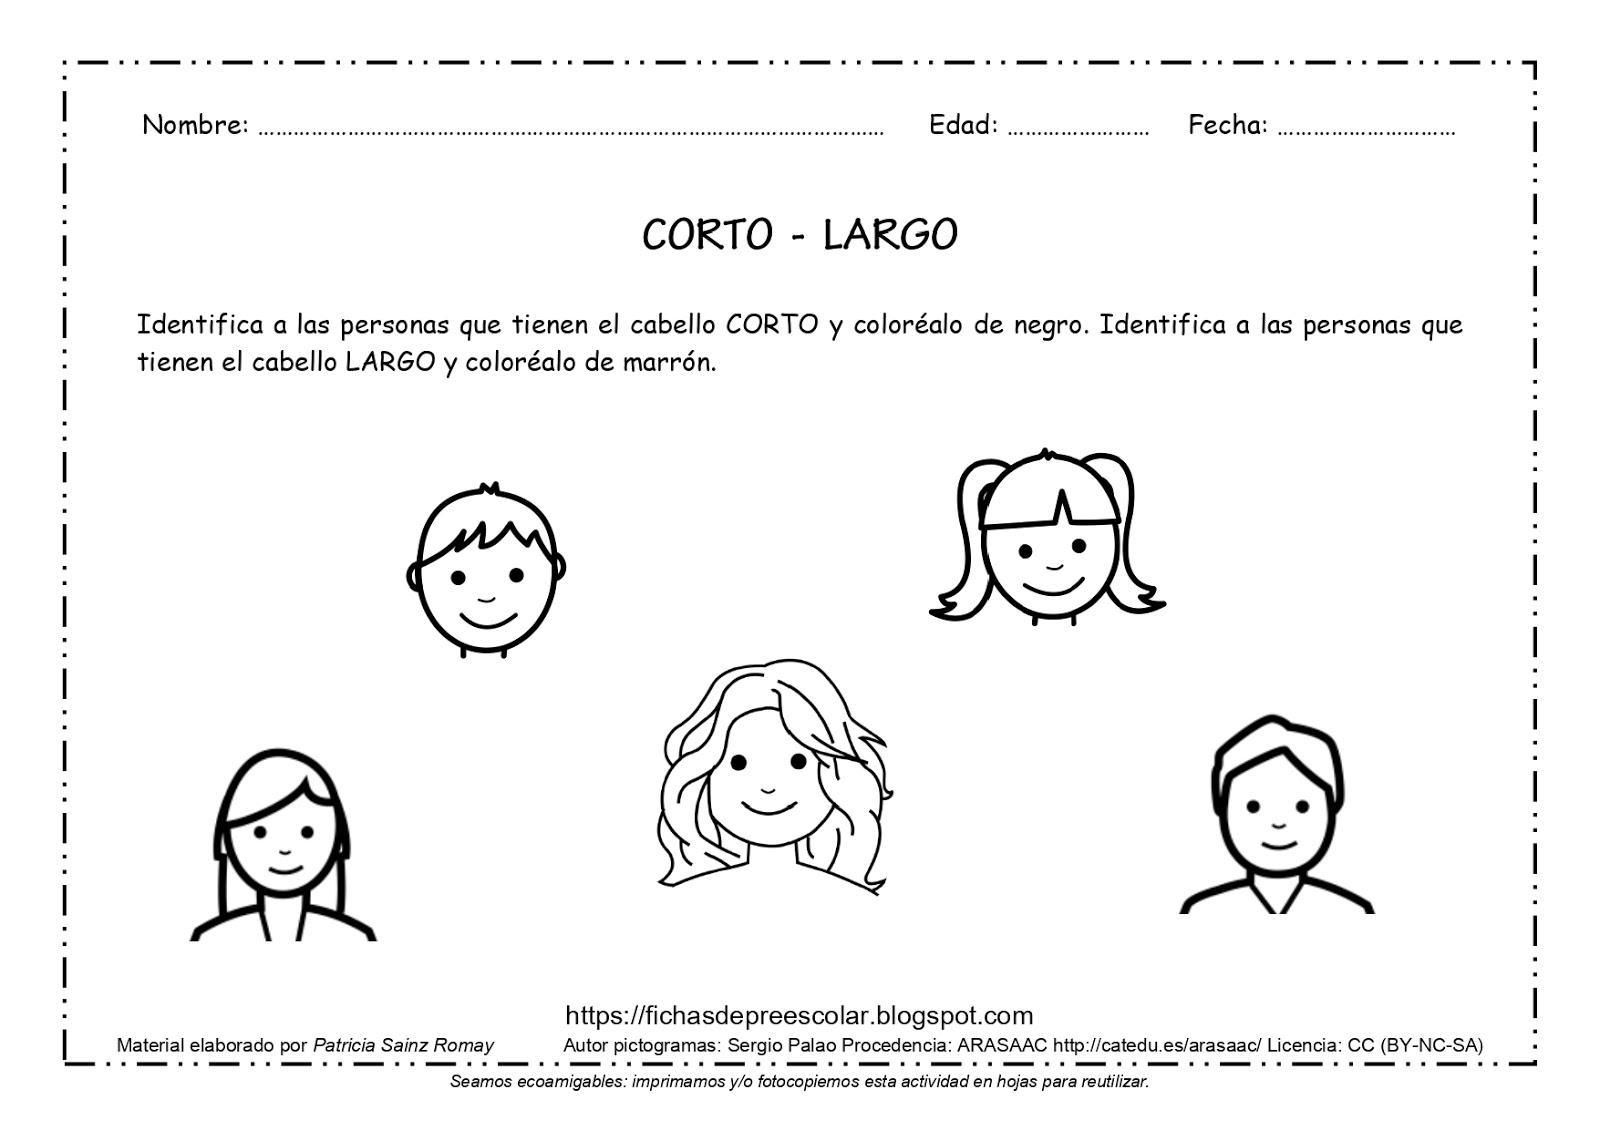 Fichas De Educación Preescolar Fichas De Conceptos Básicos